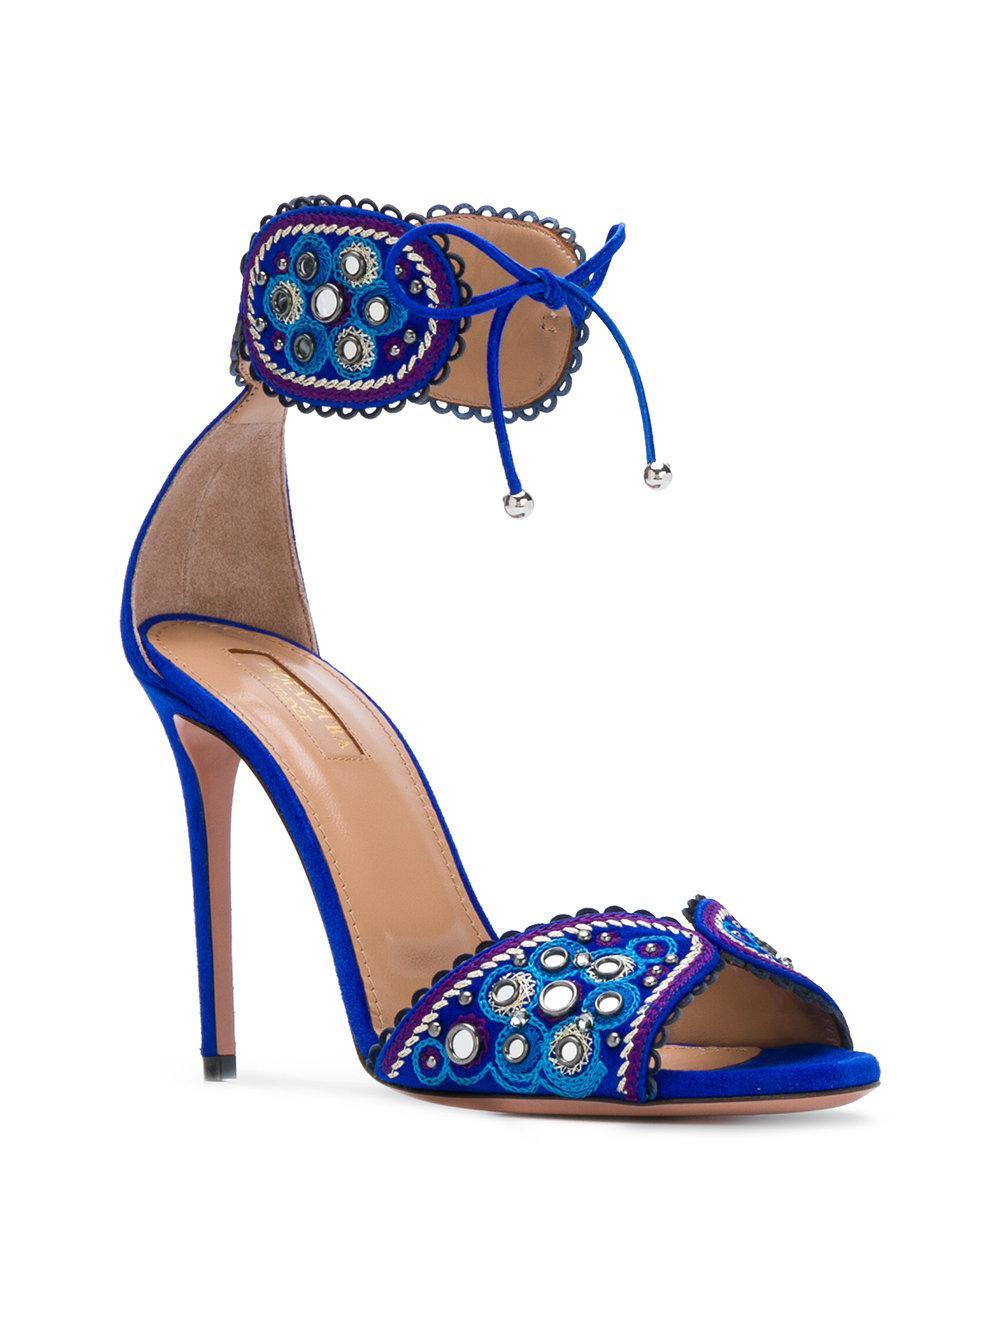 fbd0473c7 Lyst - Aquazzura Jaipur Sandals in Blue - Save 48%